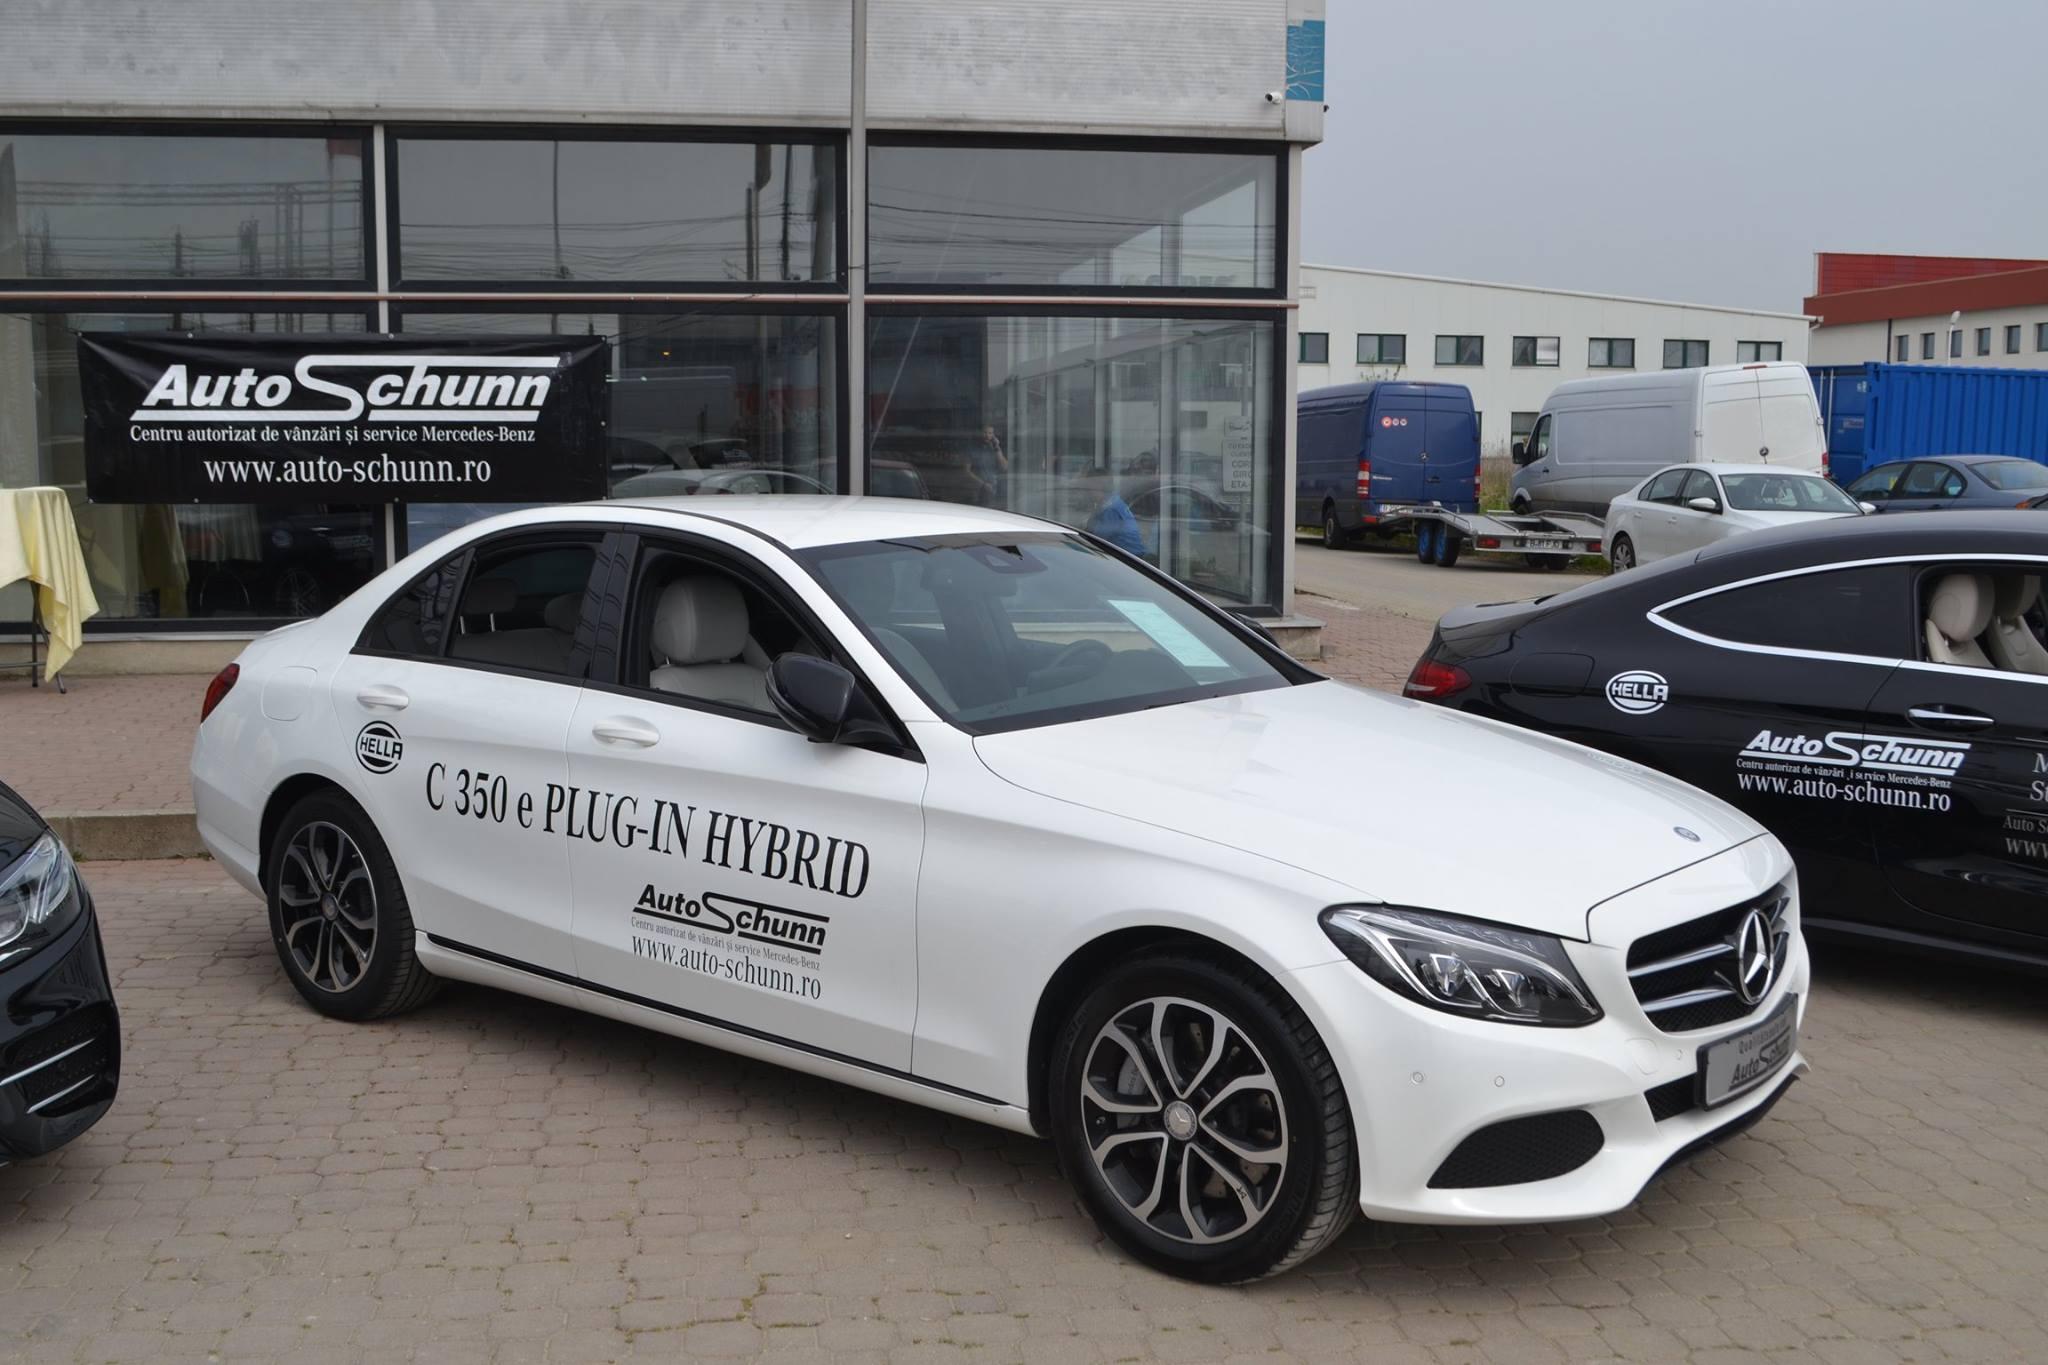 Tu ce ai alege: banii jos sau leasing Mercedes-Benz?